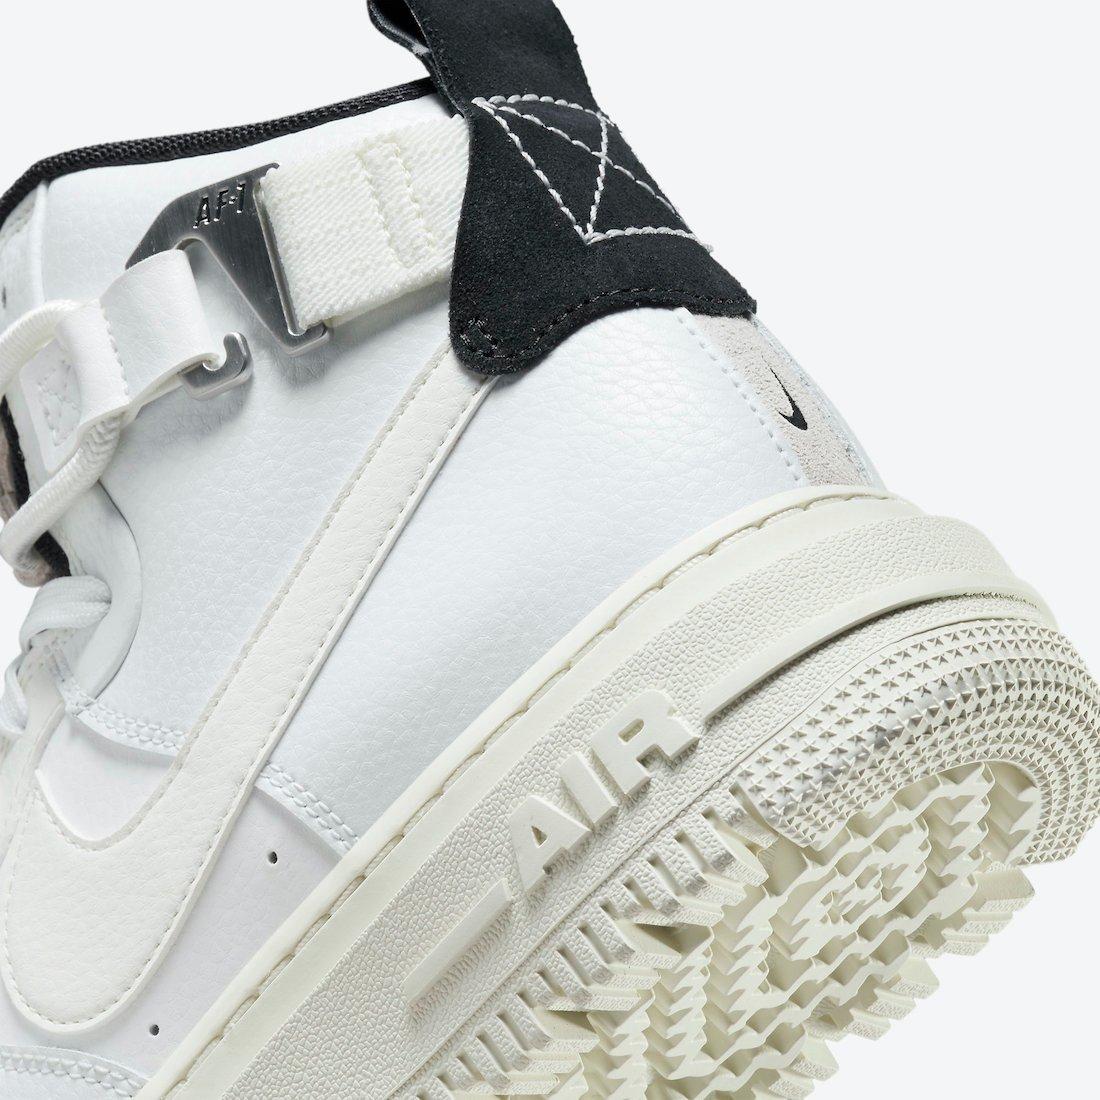 Nike Air Force 1 High Utility 2.0 Summit White Sail Black DC3584-100 Release Date Info